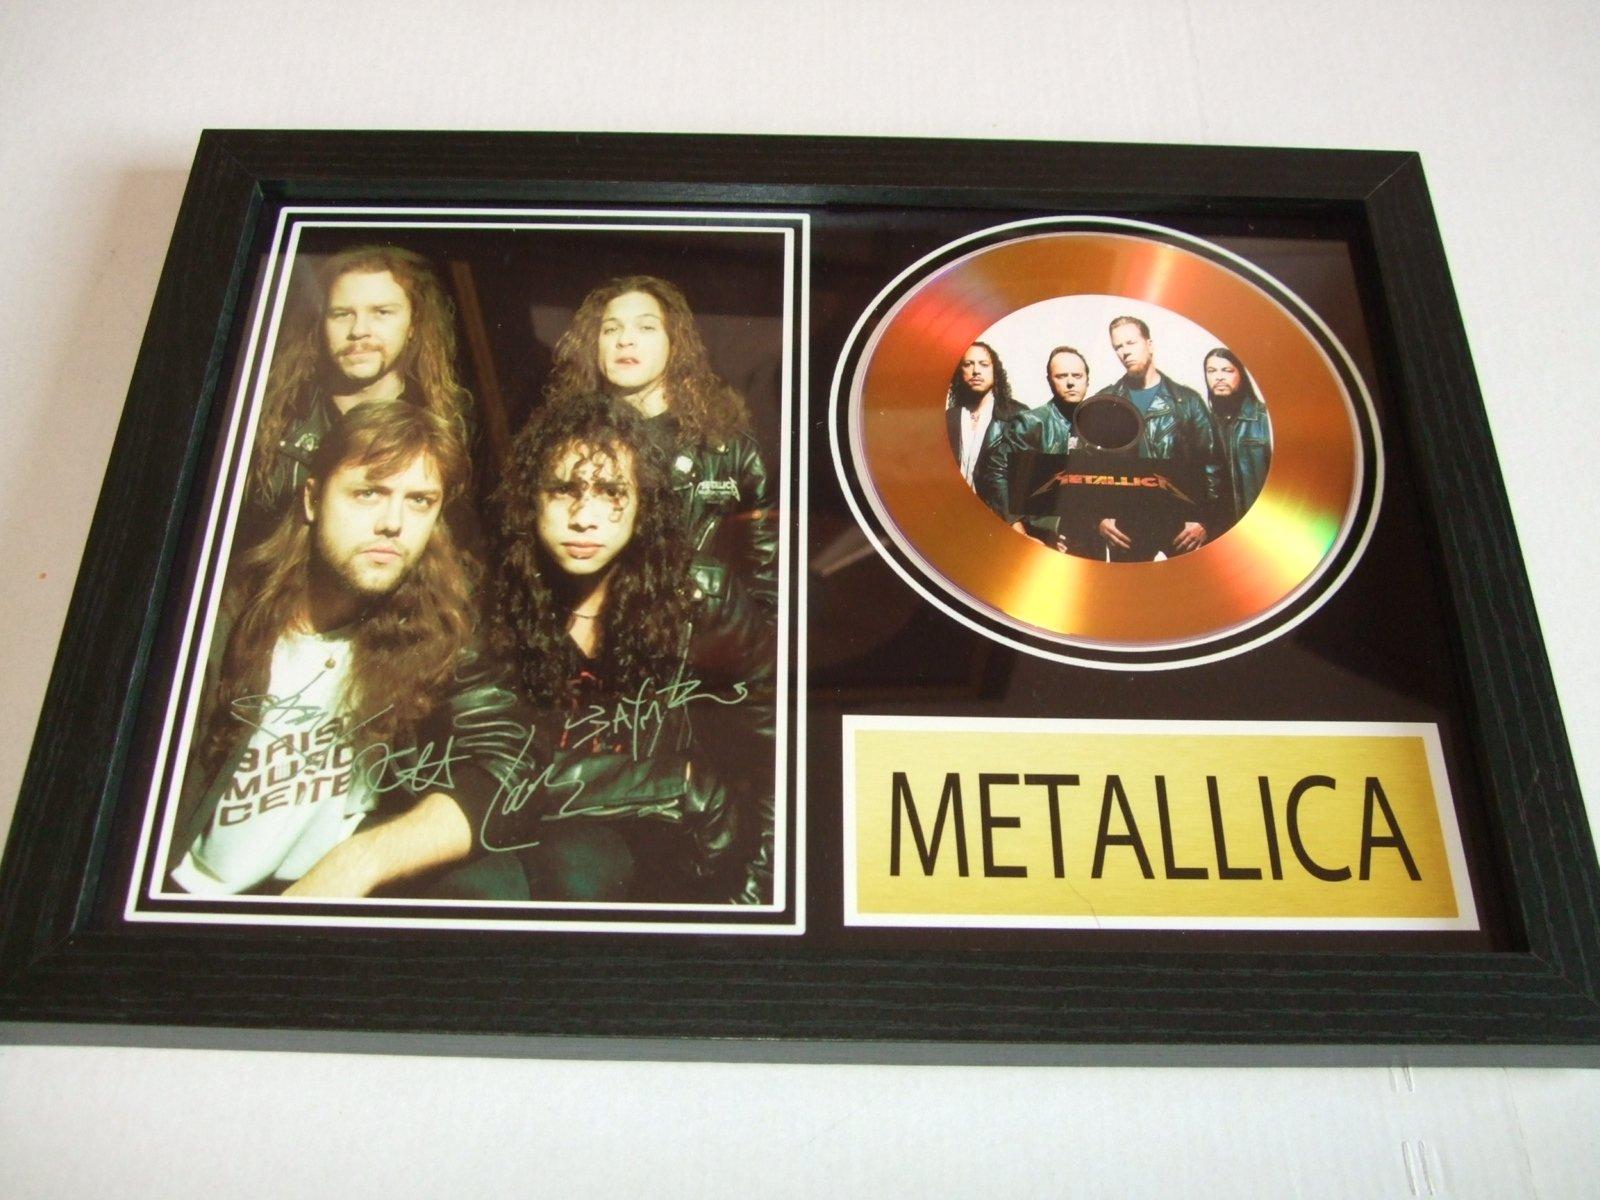 metallica signed gold disc